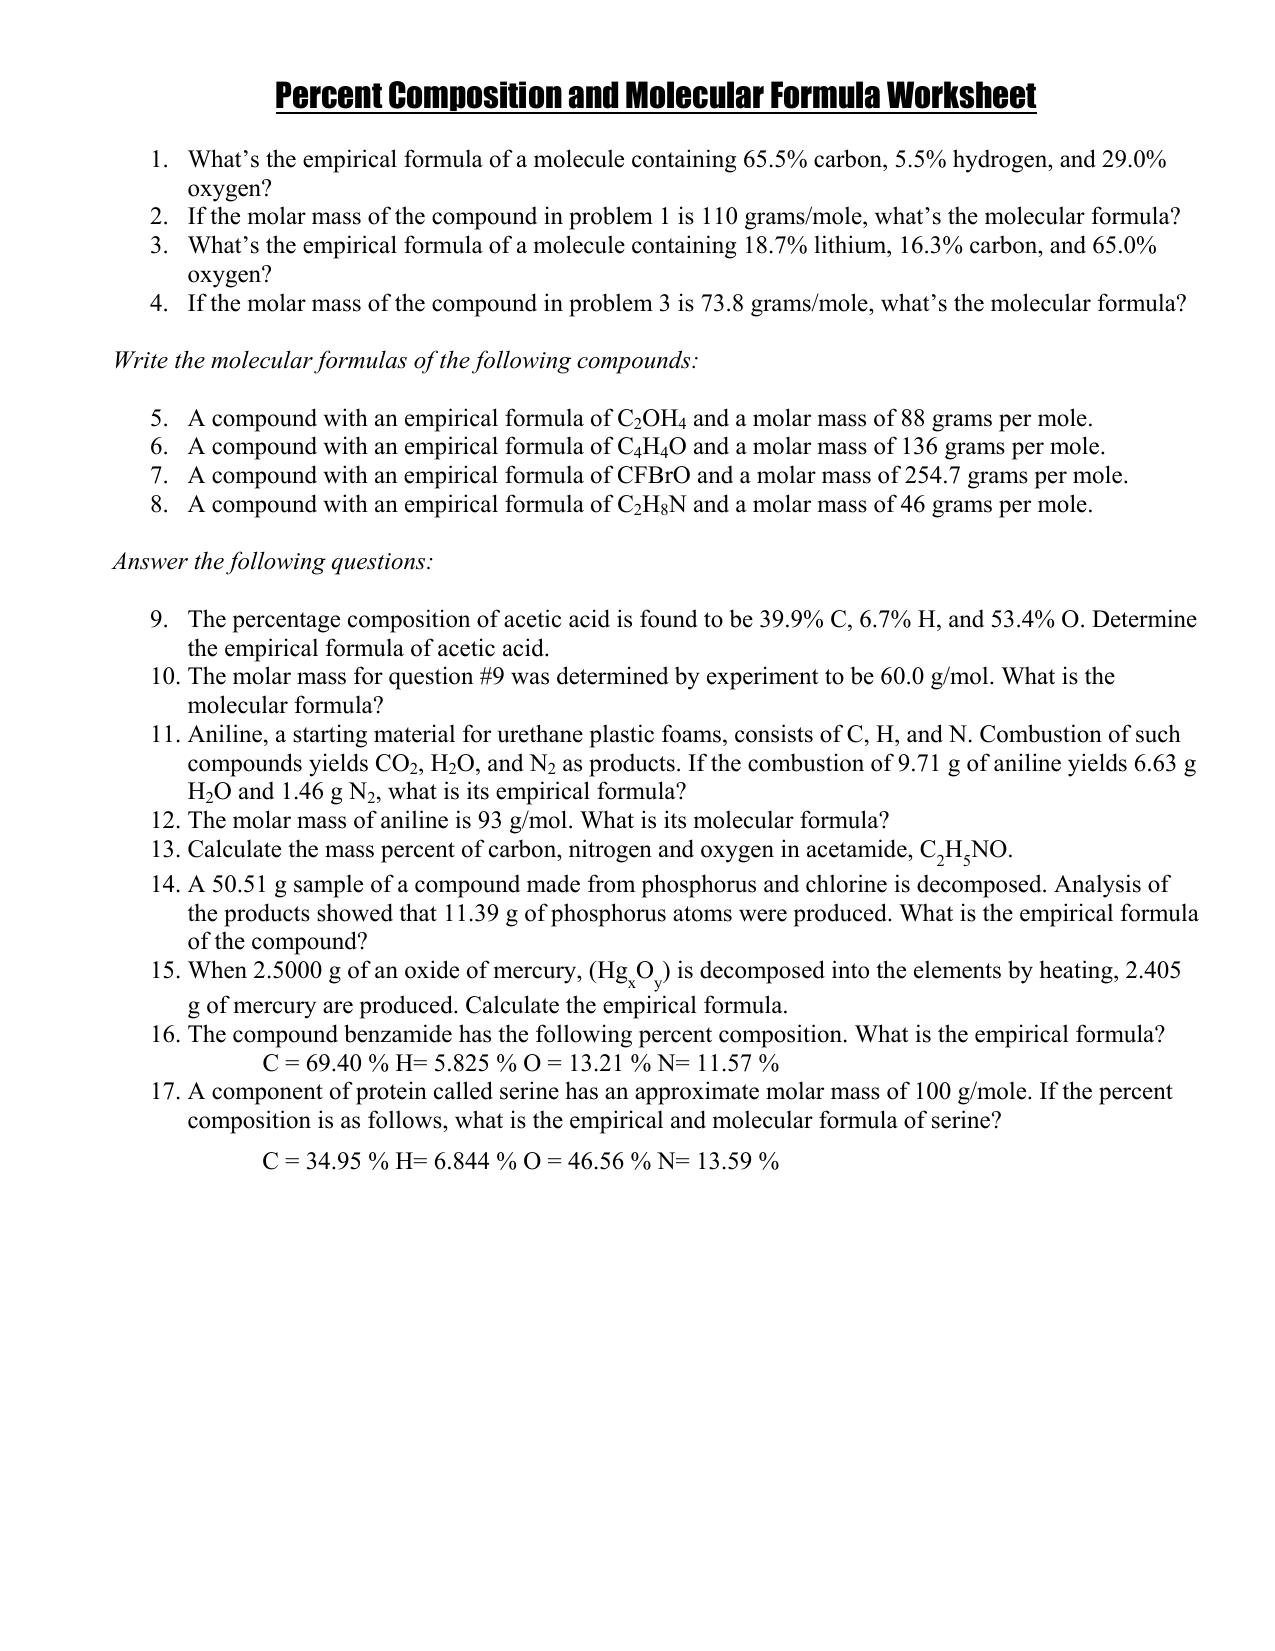 Worksheets Empirical Formulas Worksheet empirical formula worksheet with solutions best photos about percent position and molecular worksheet